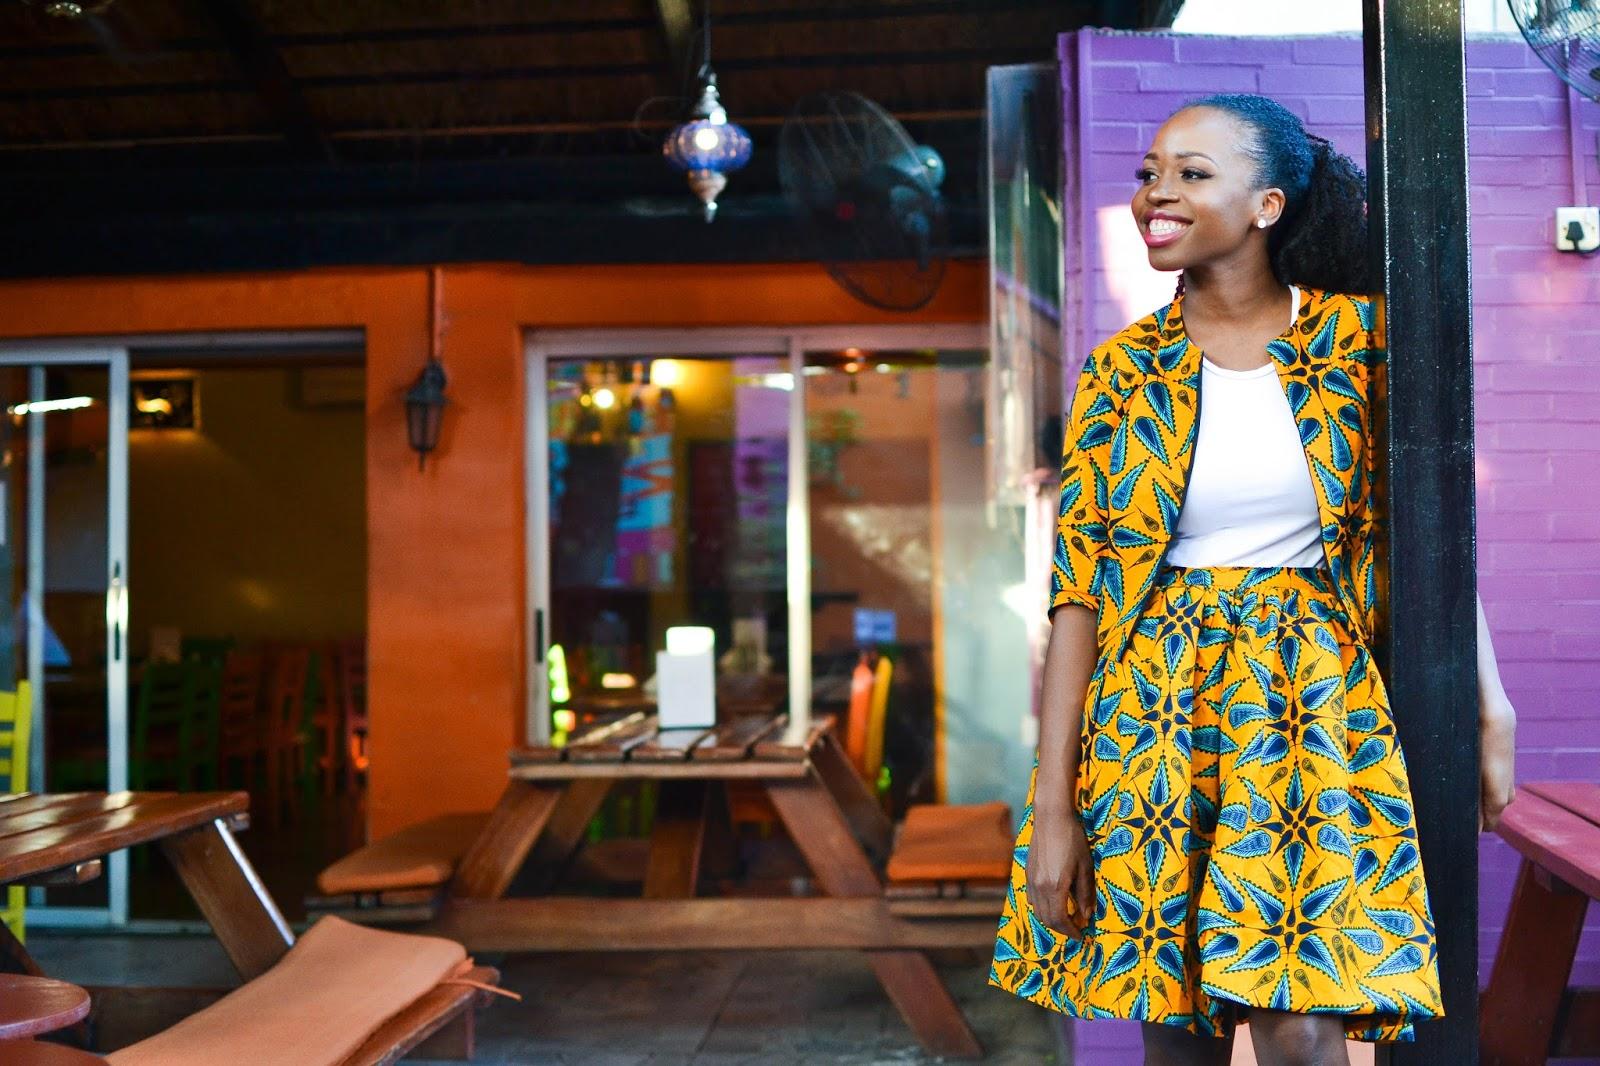 Ankara Skirt Suit on a Black Fashion Blogger